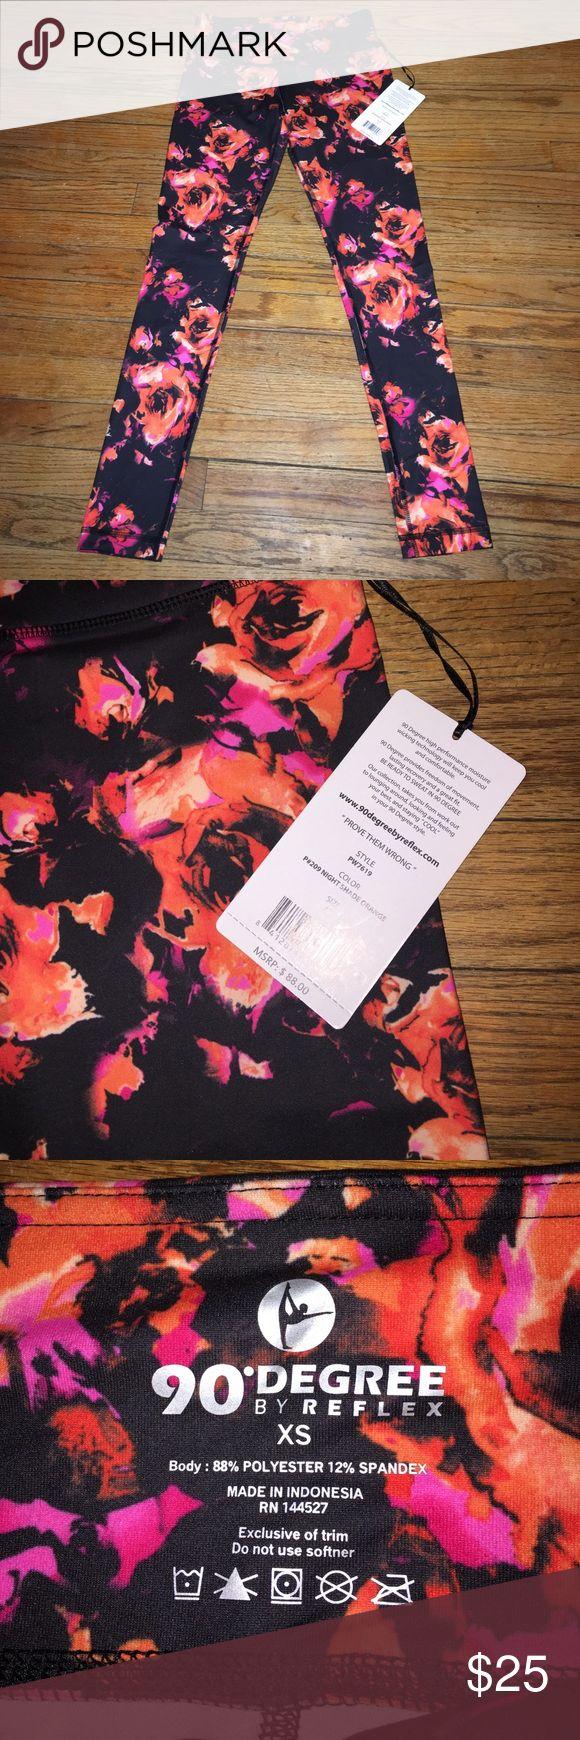 NWT Floral leggings by 90 Degrees REFLEX SZ: XS Floral leggings in night shade orange  by 90 Degrees REFLEX SZ: XS 90 Degree By Reflex Pants Leggings